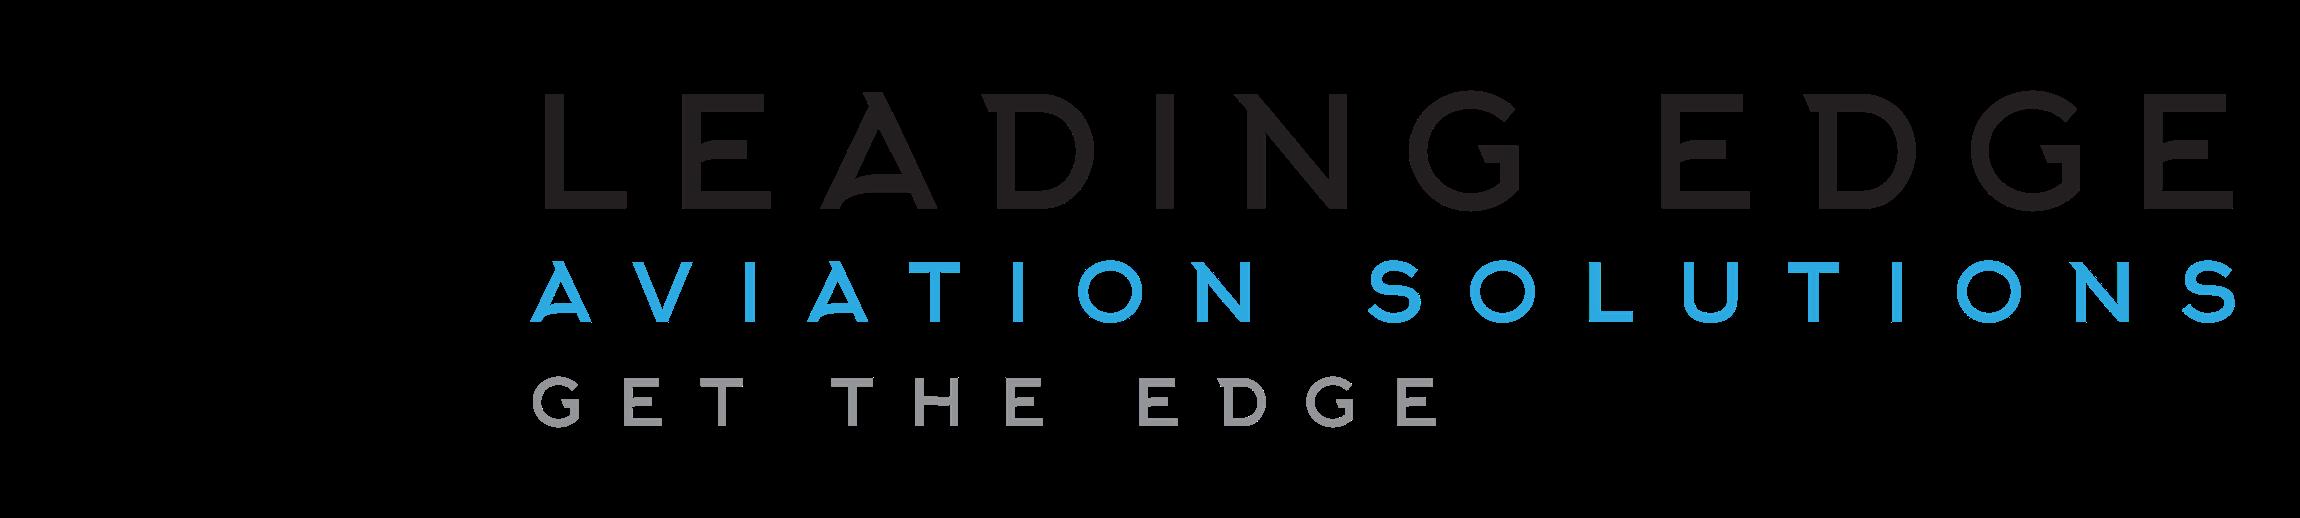 Leading Edge Aviation Solutions, LLC logo